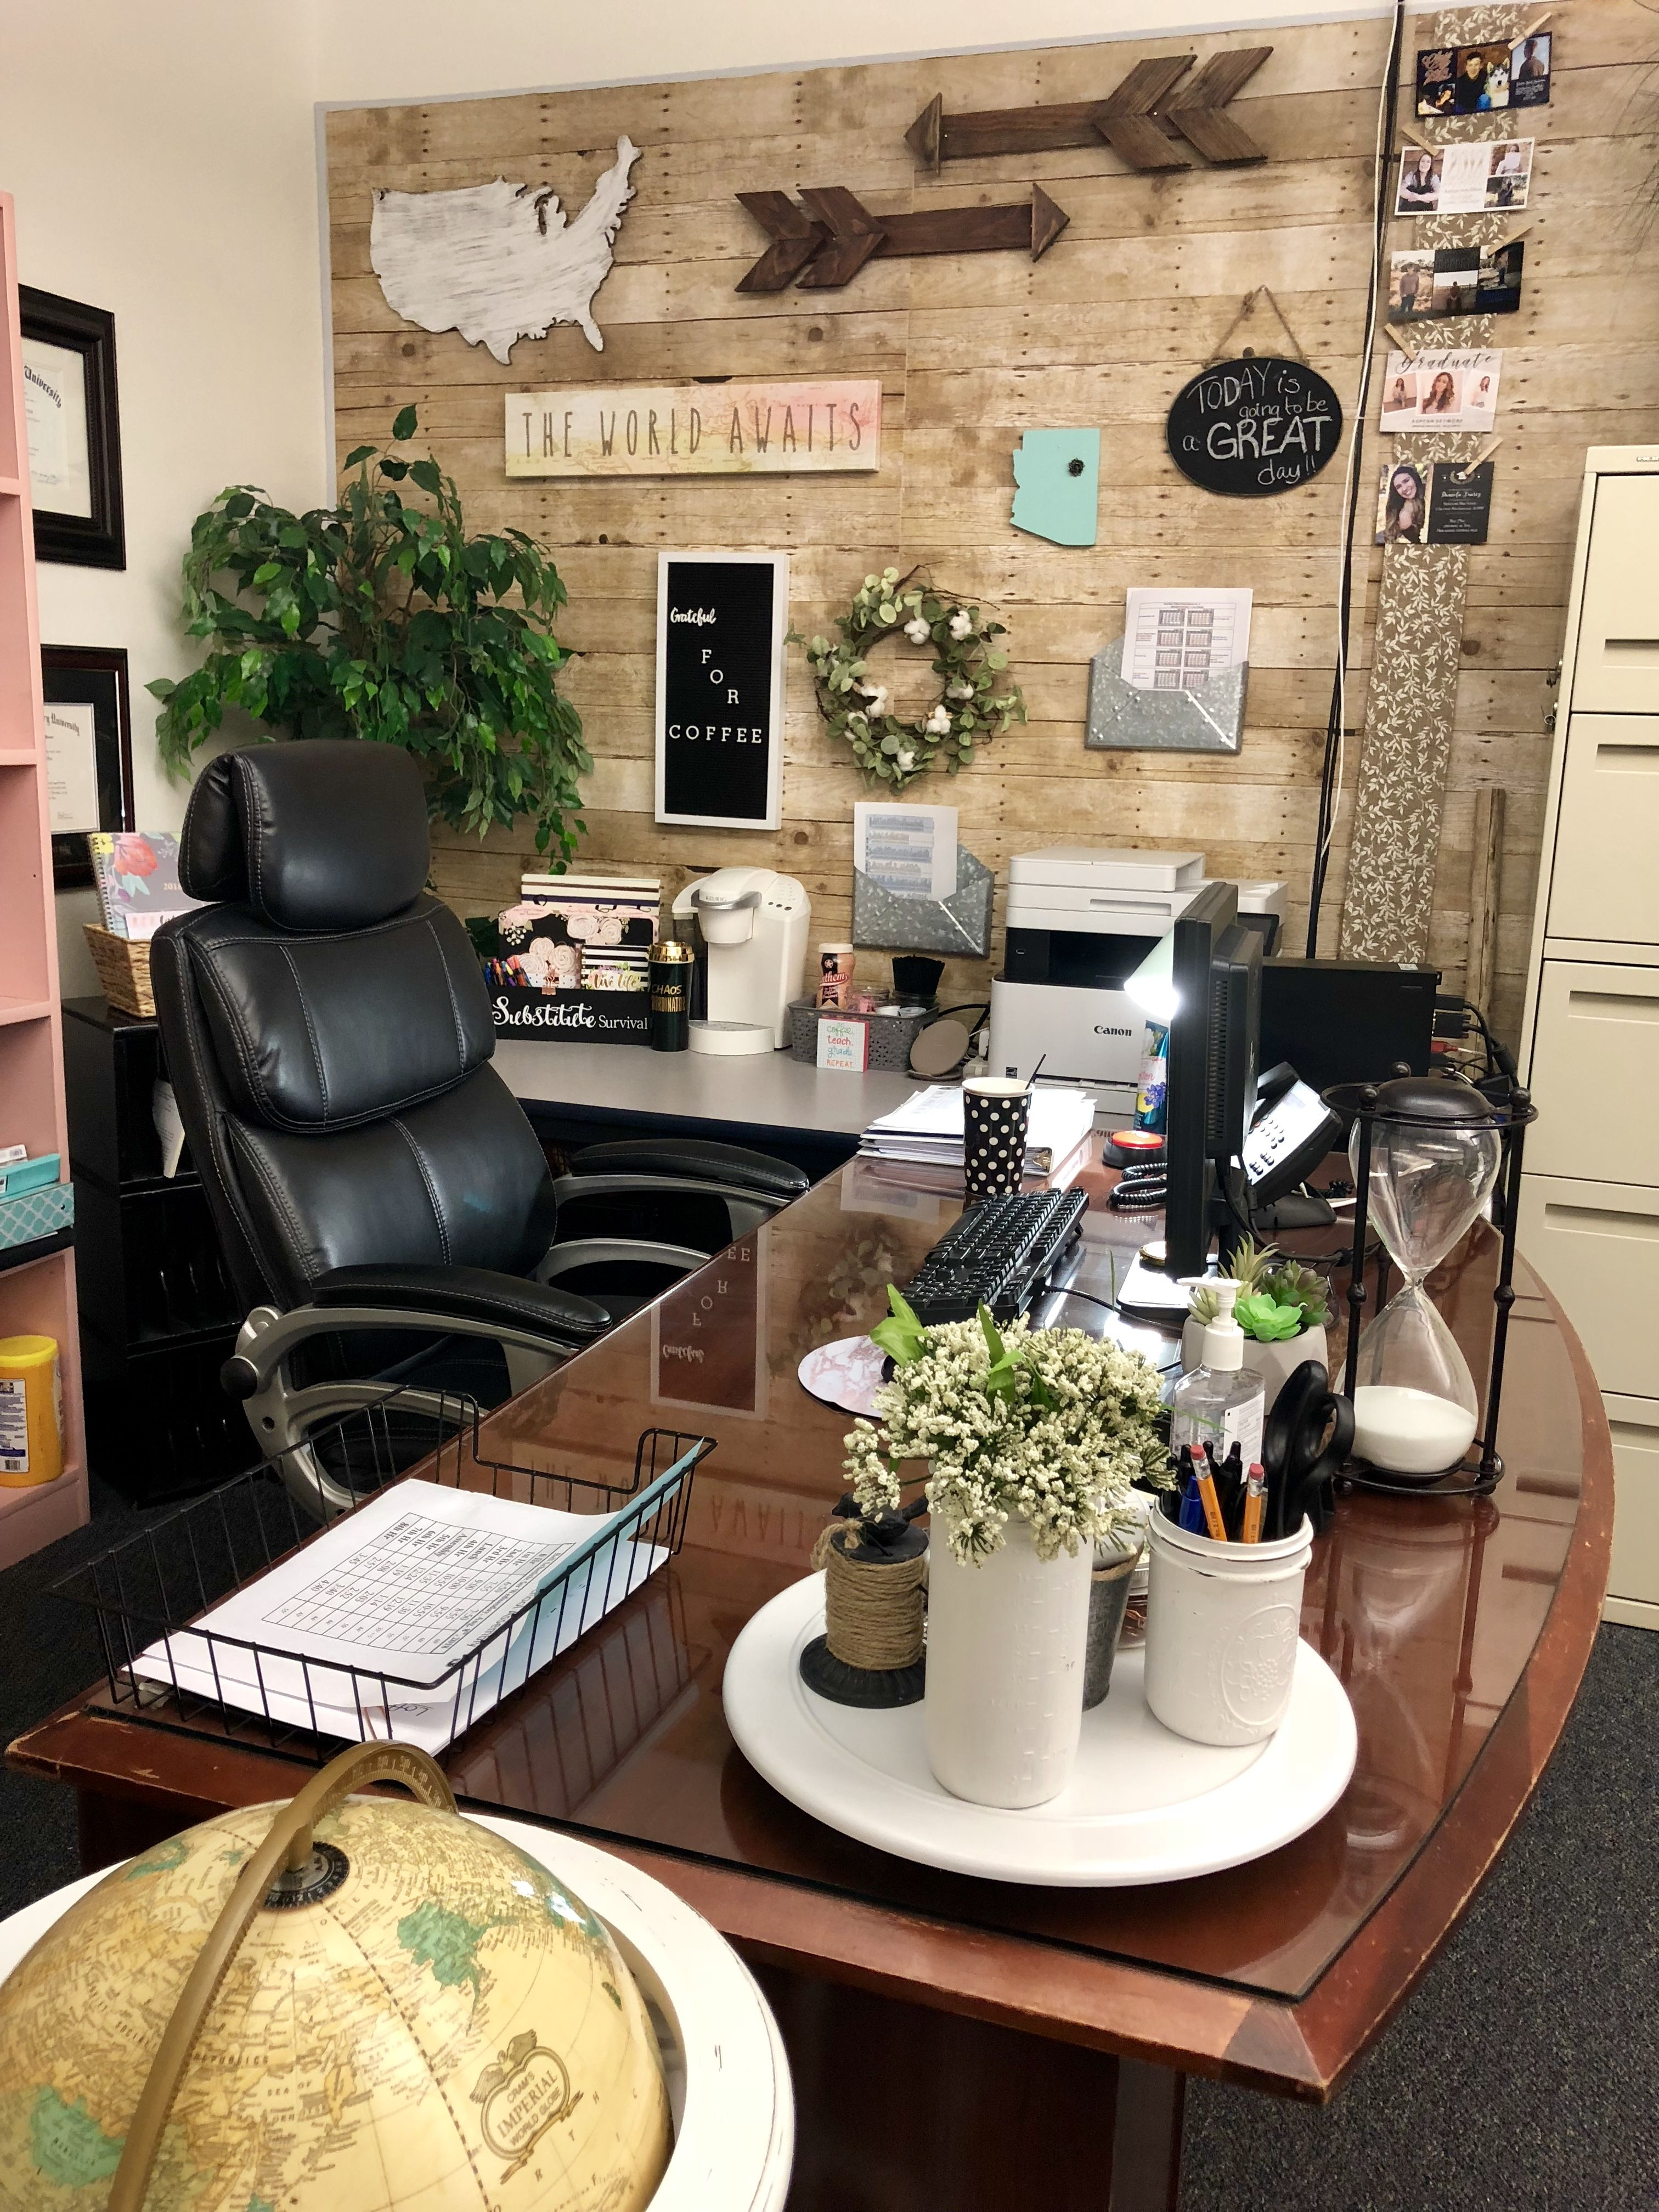 My Desk Area In My Classroom Farmhouse Classroom Decor Teacher Desk Organization Classroom Decor Classroom Desk